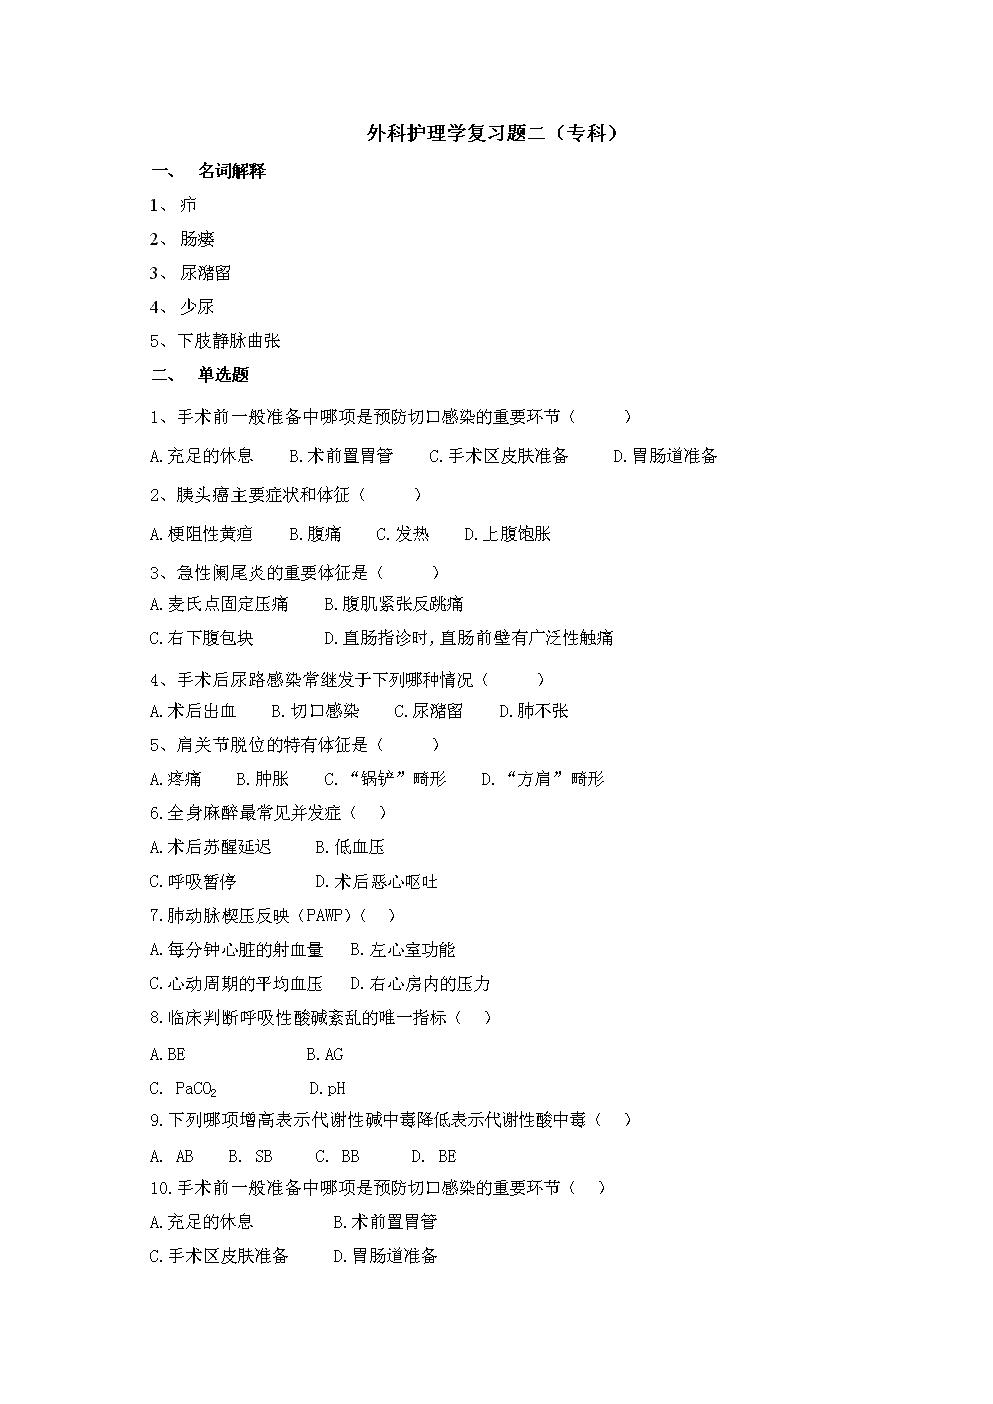 外科二练习题.doc